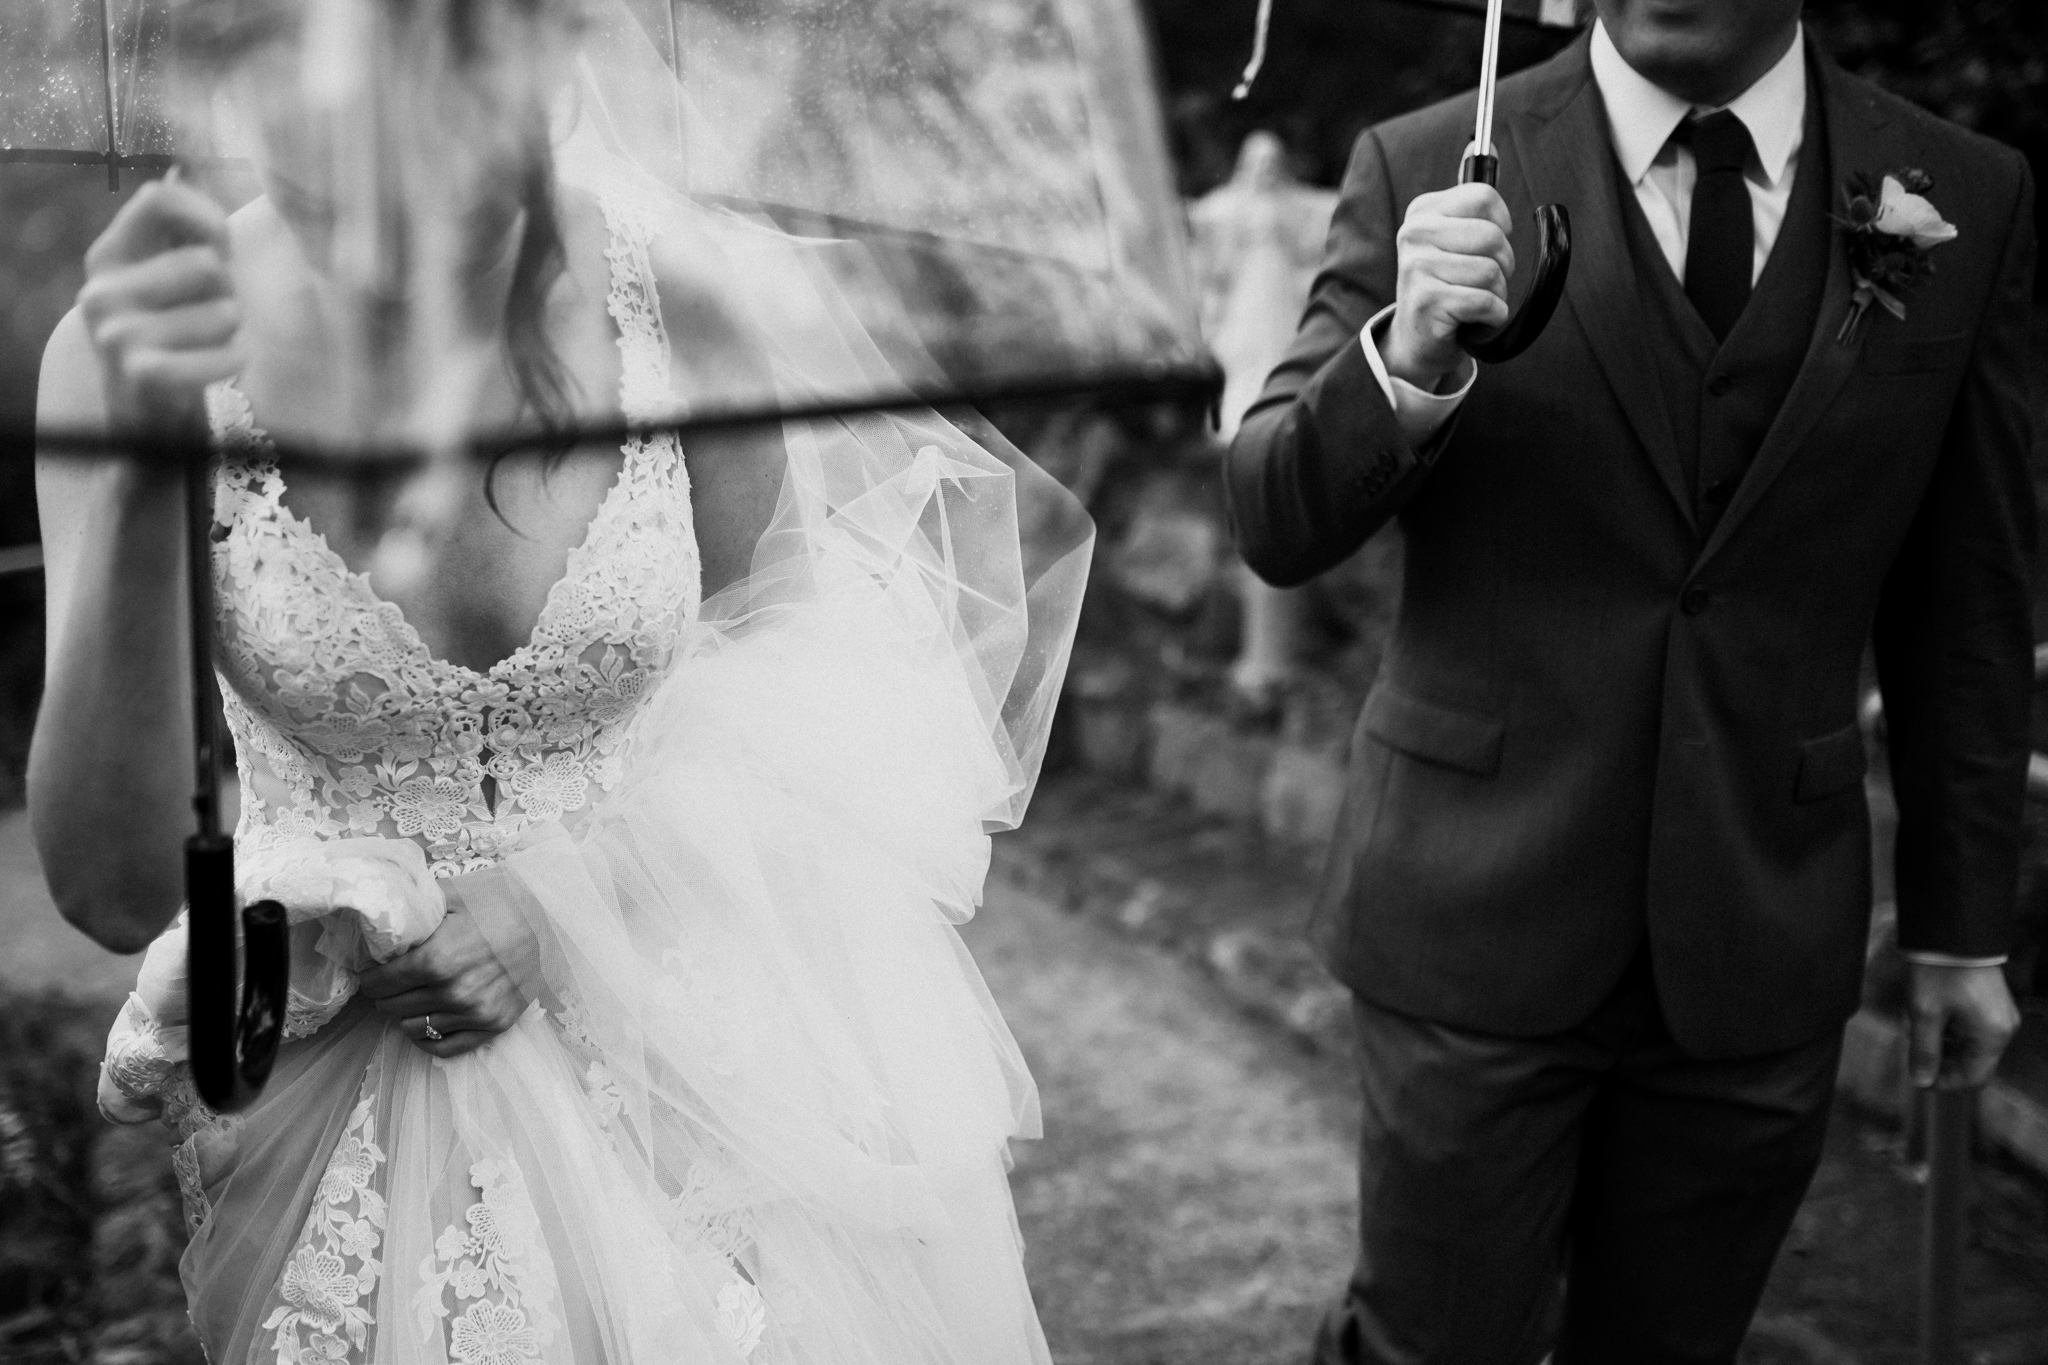 birmingham-alabama-wedding-photographer-laura-terry-the-warmth-around-you (66 of 110).jpg